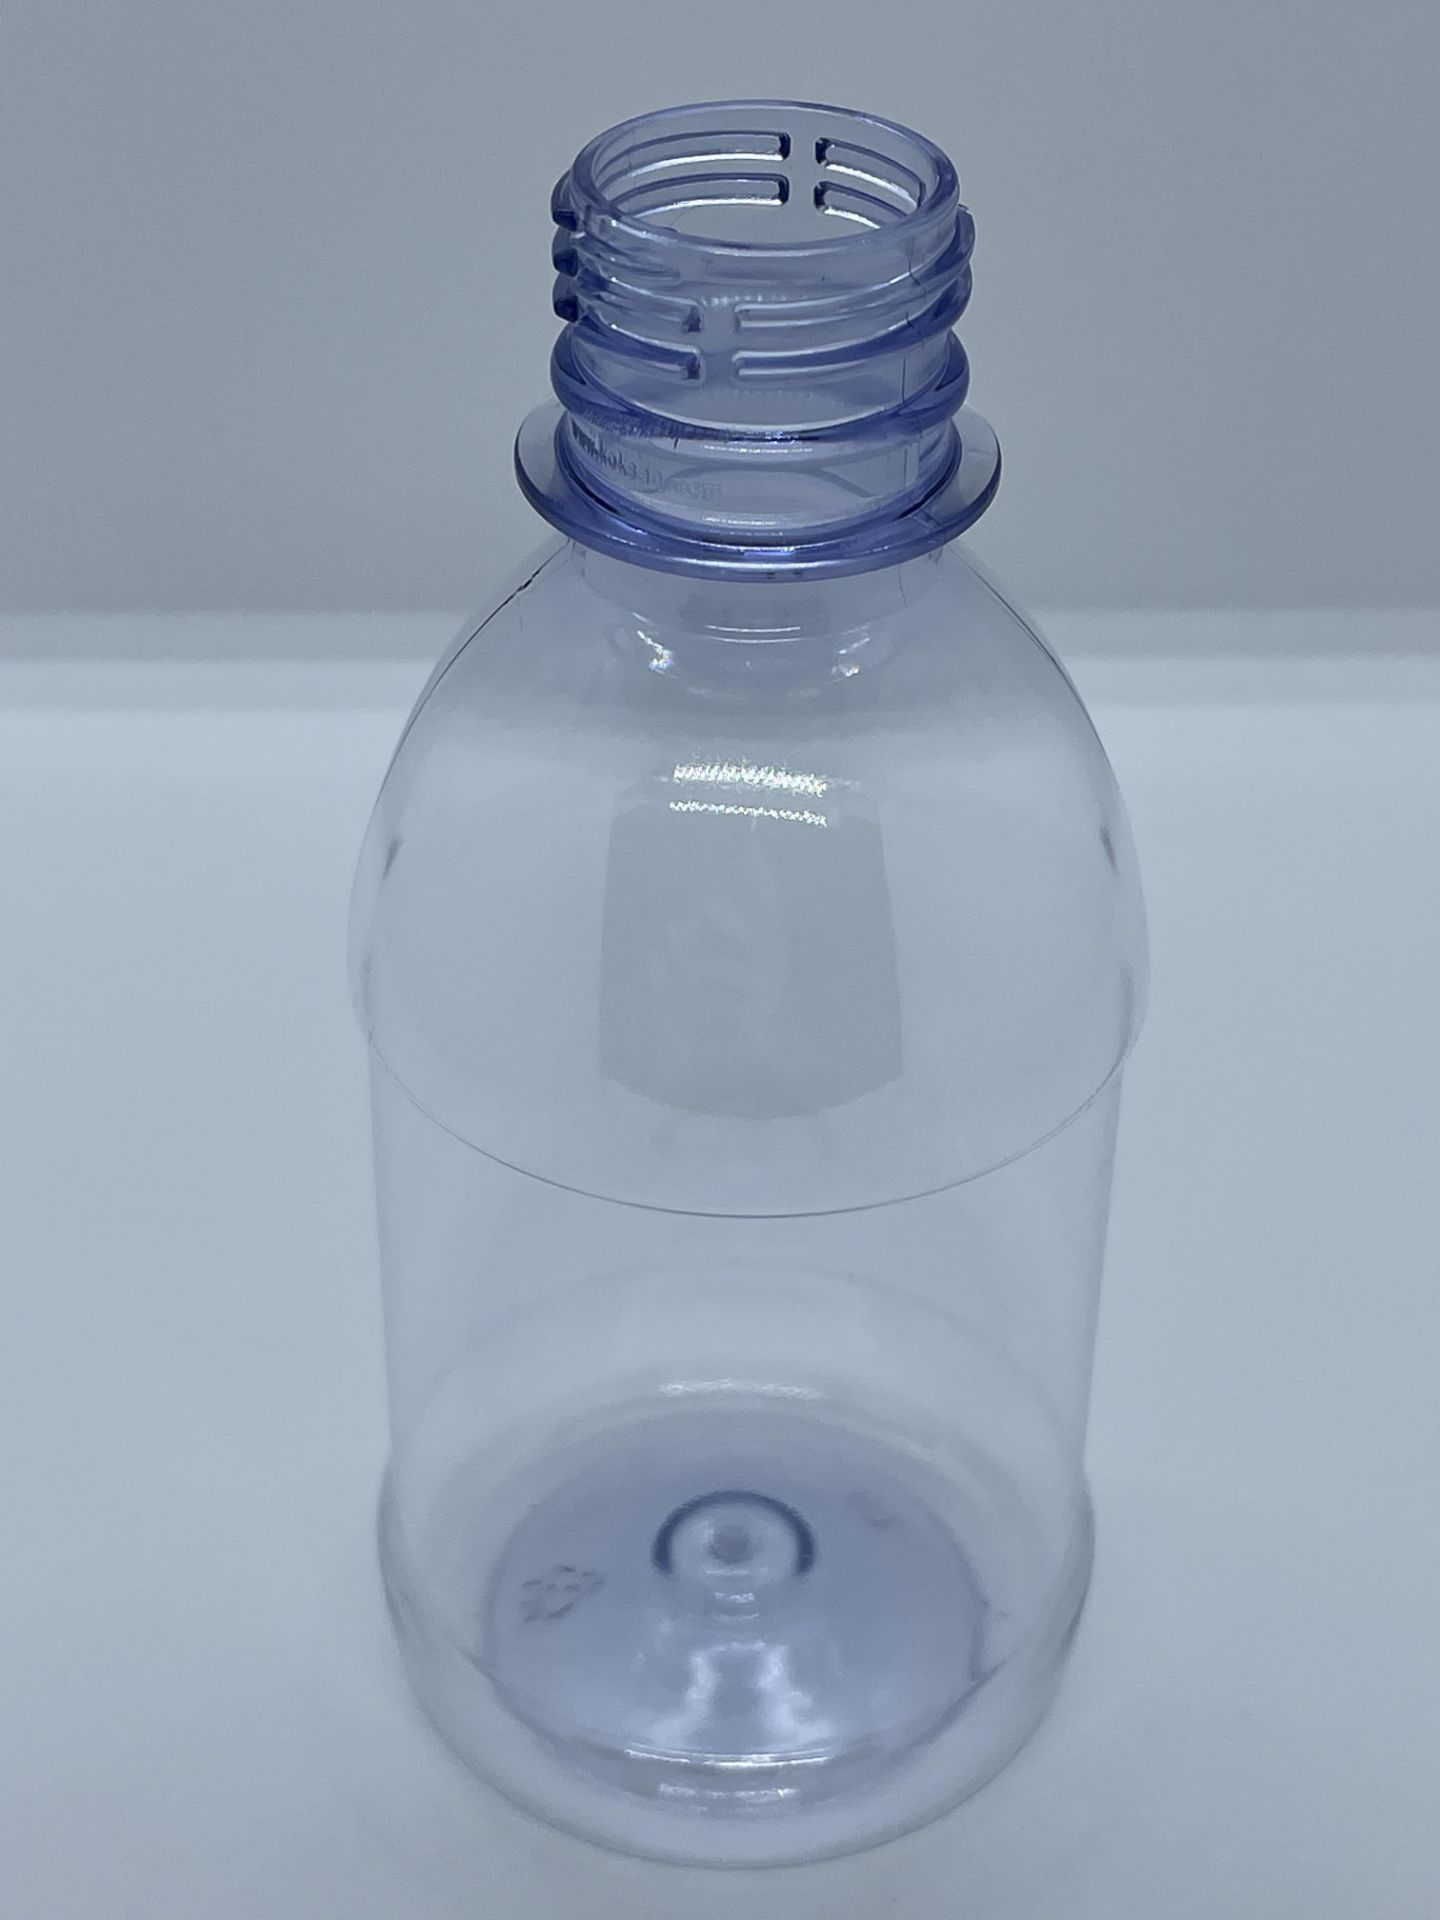 "158,000 - 8 oz Empty Plastic Bottles, Neck Threading 28-410, 5.25"" Tall x 2.25"" Diameter - Image 2 of 5"